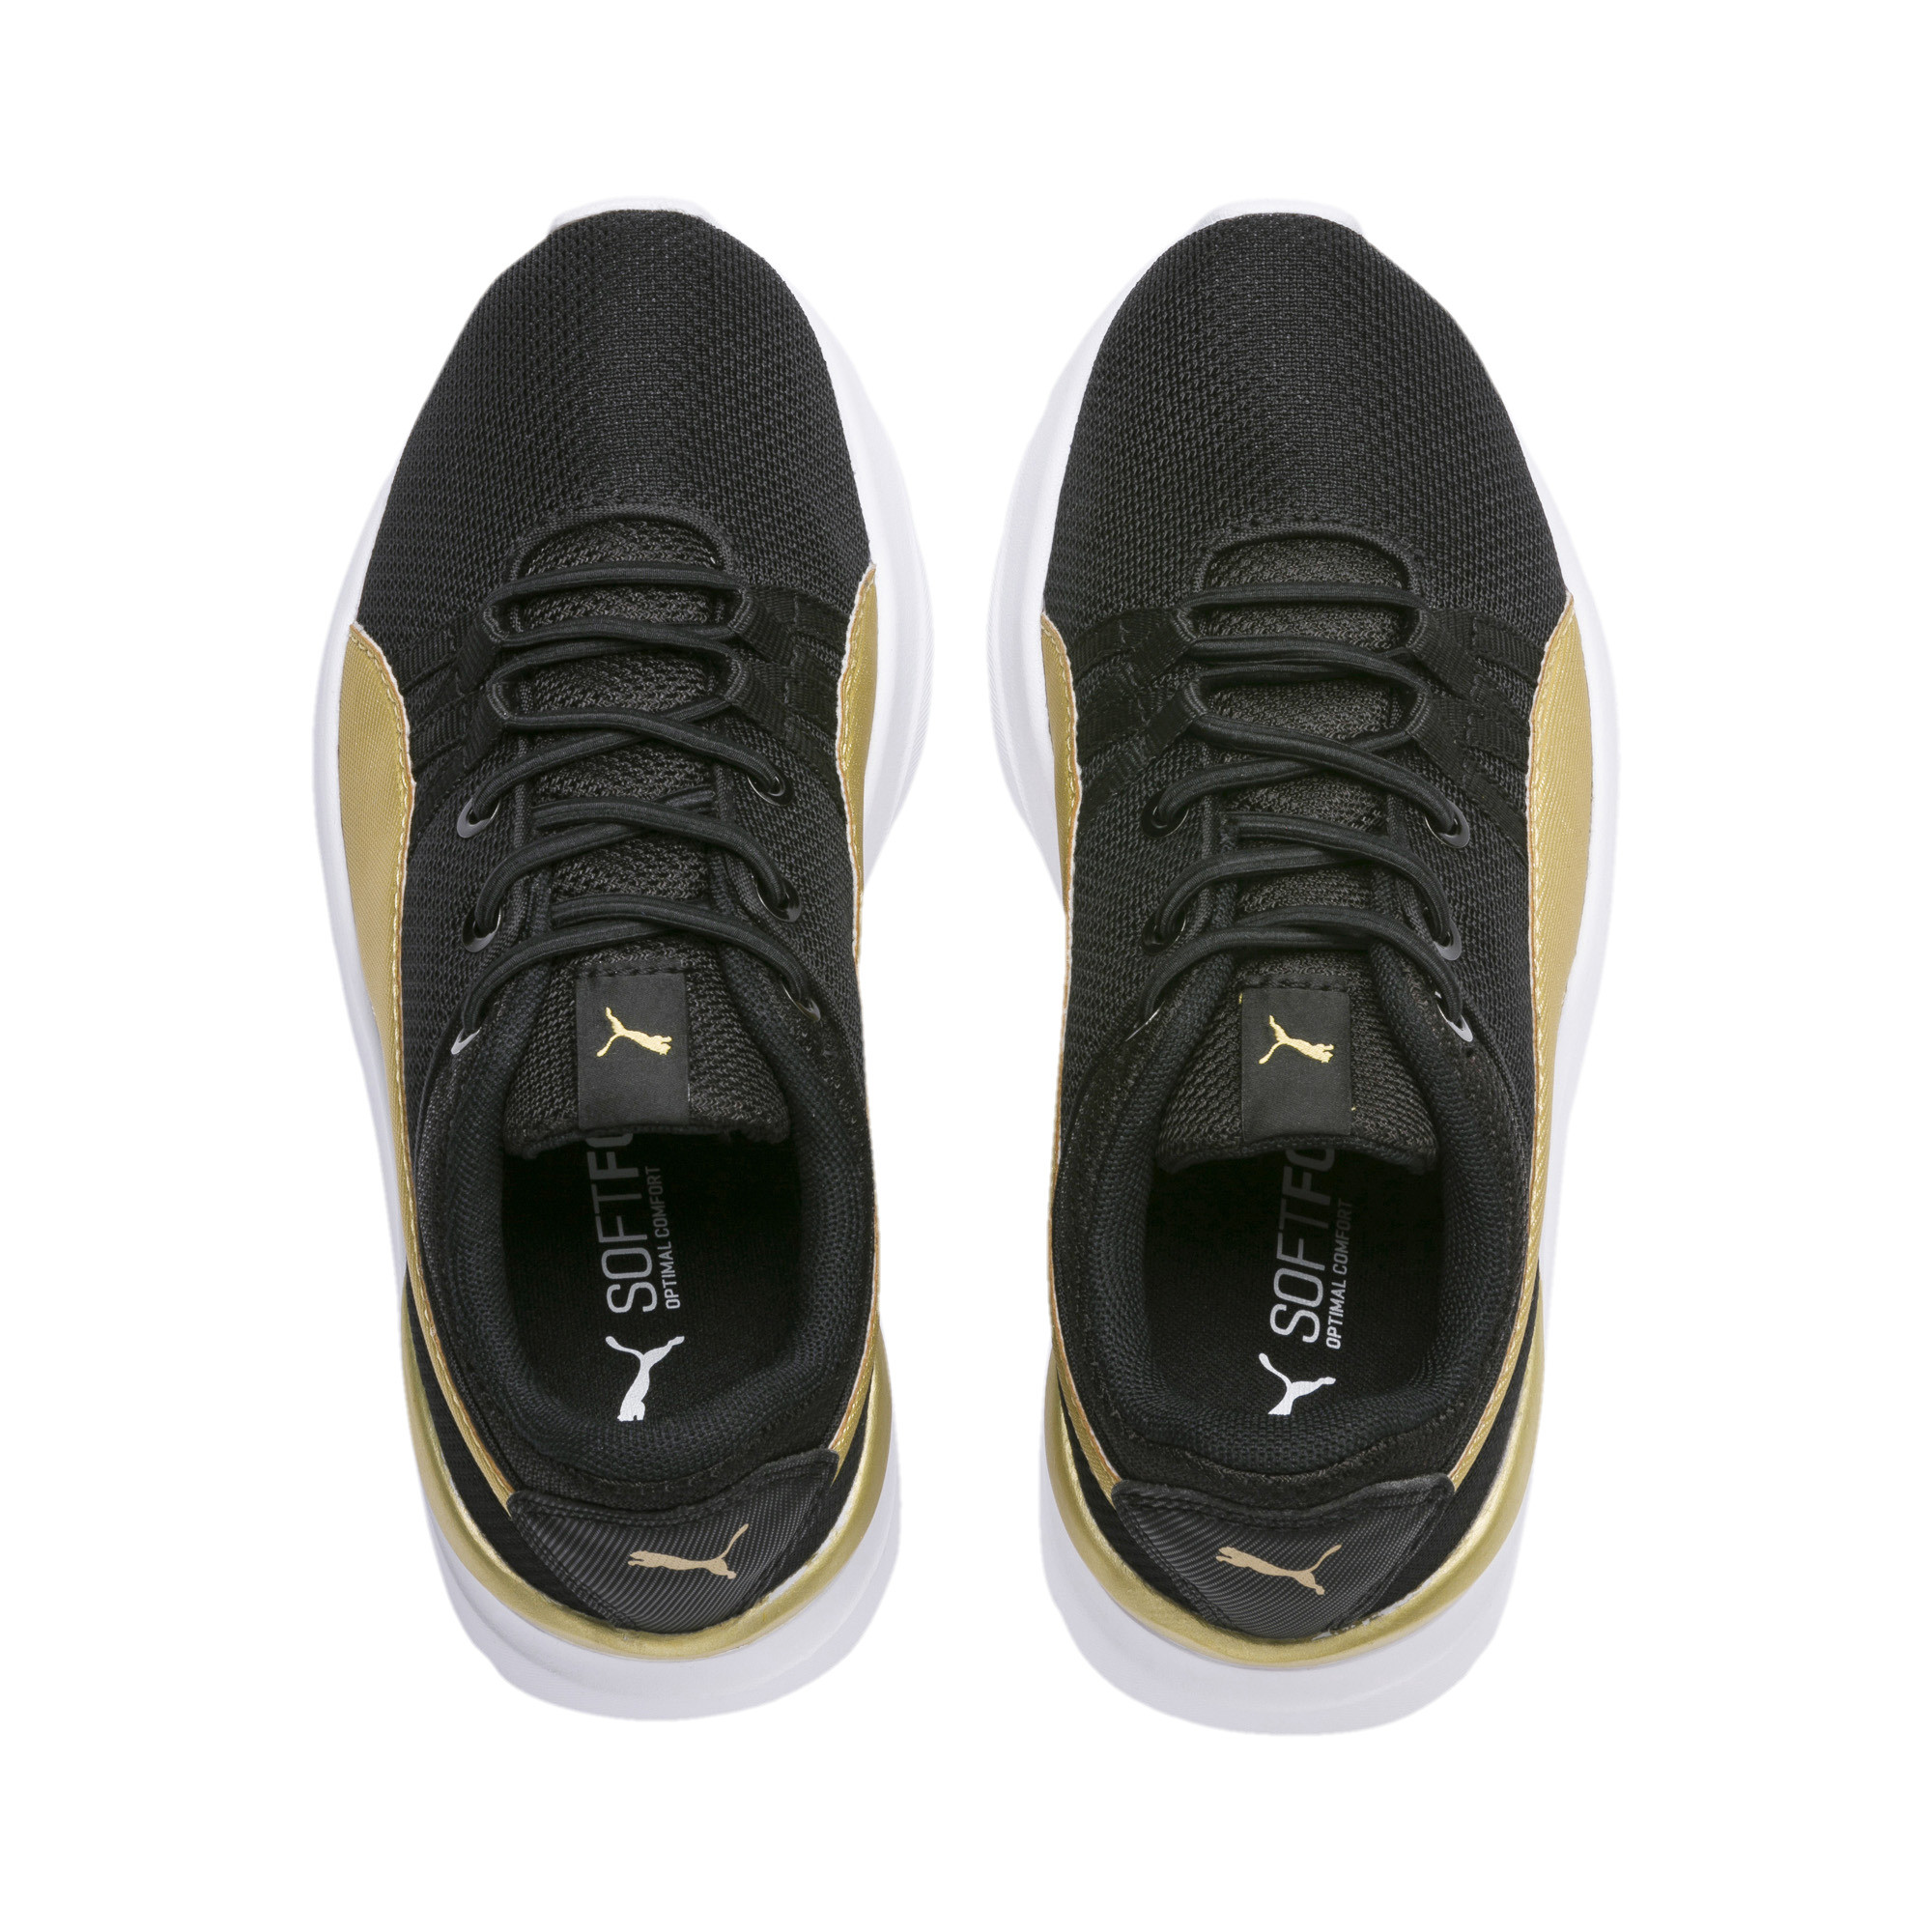 PUMA-Adela-Breathe-AC-Sneakers-PS-Girls-Shoe-Kids thumbnail 7